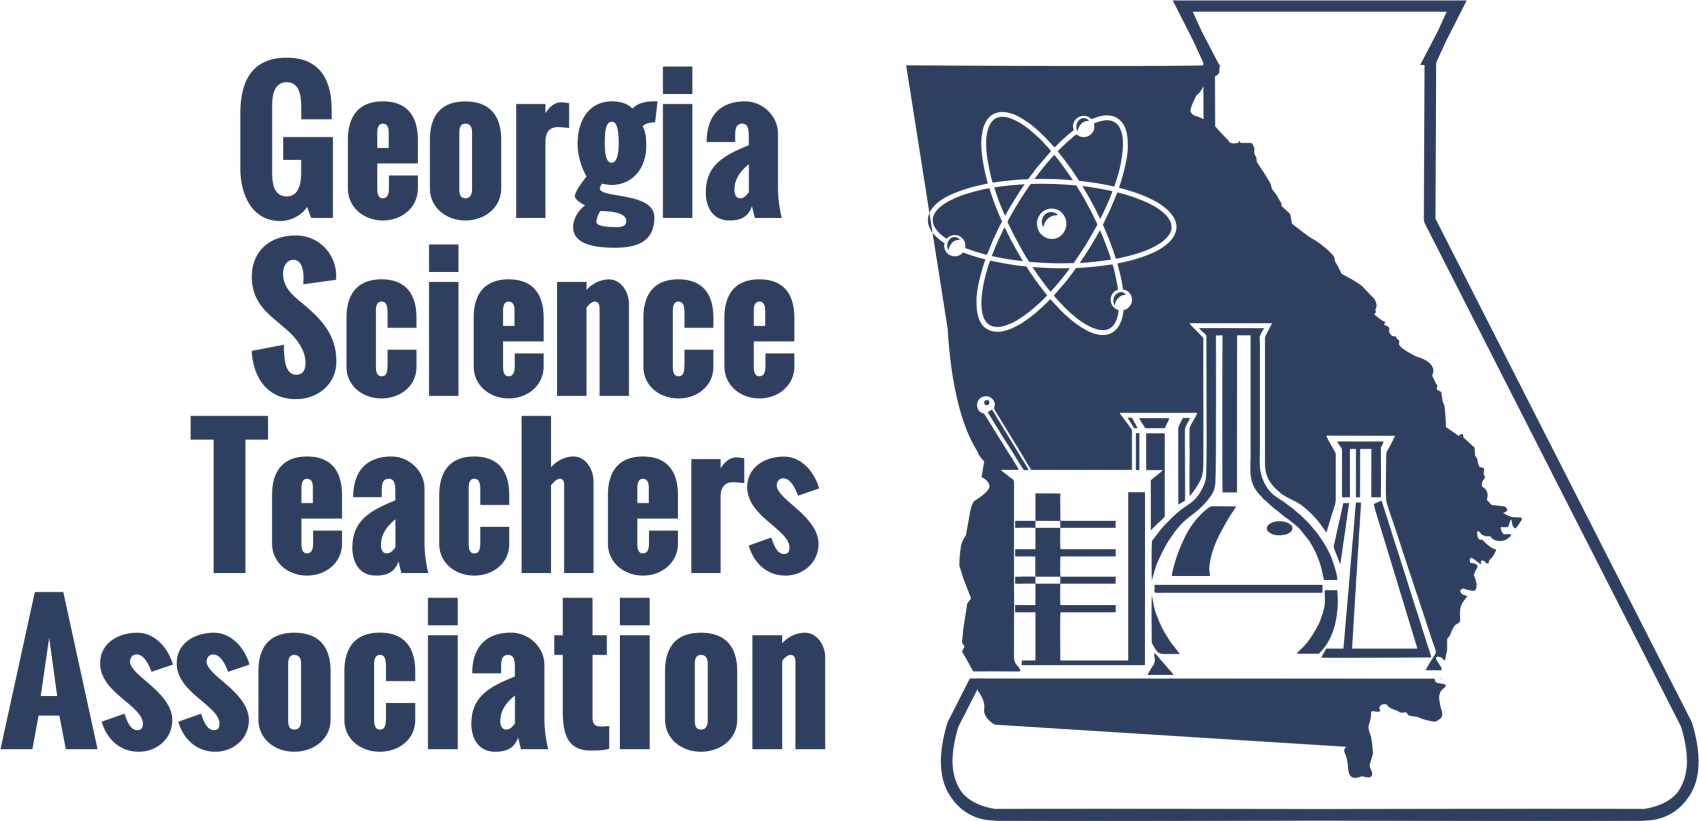 Georgia Science Teachers Association Eobservations Current Issue